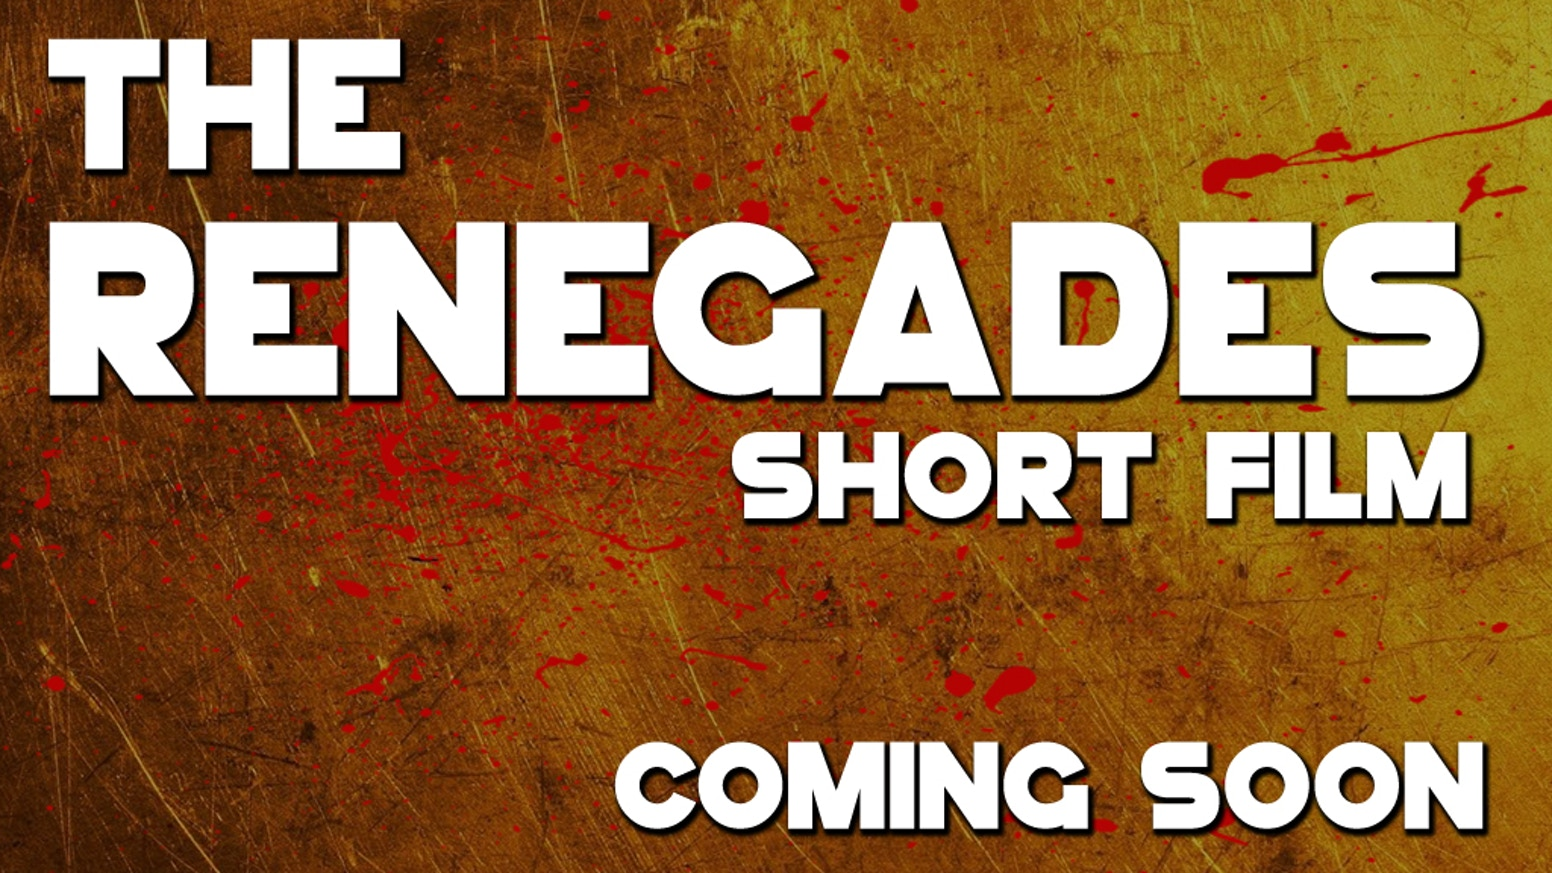 The Renegades | Short Film by Ben Williams — Kickstarter